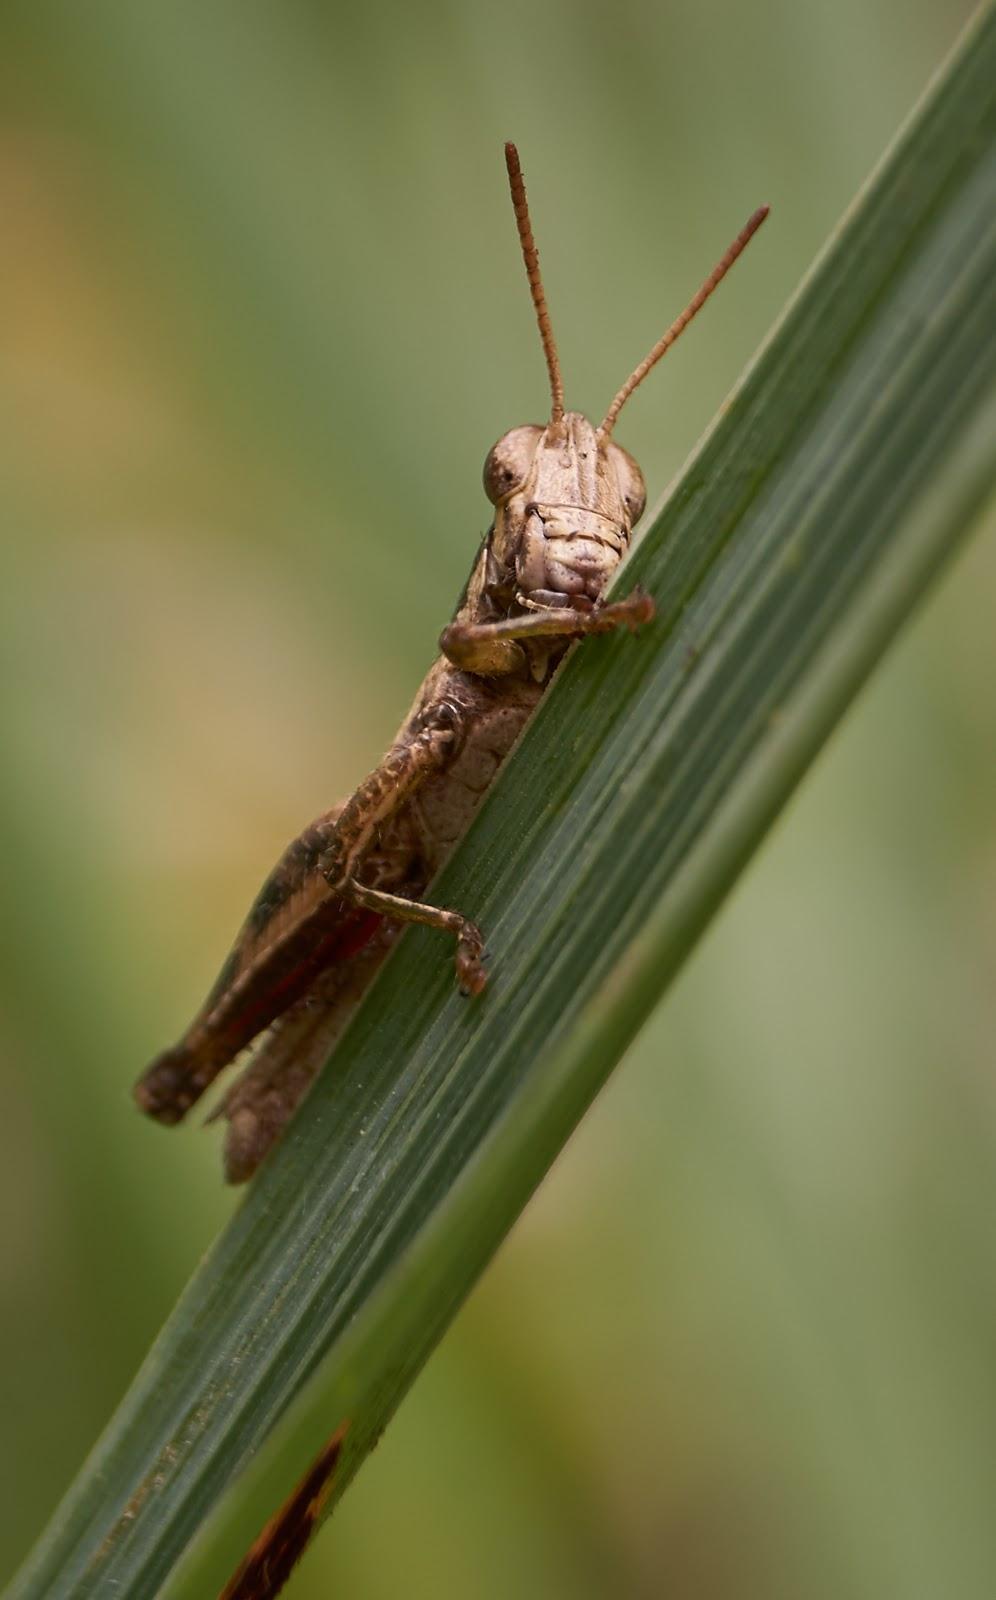 grasshopper,close-up,regal,Philippines